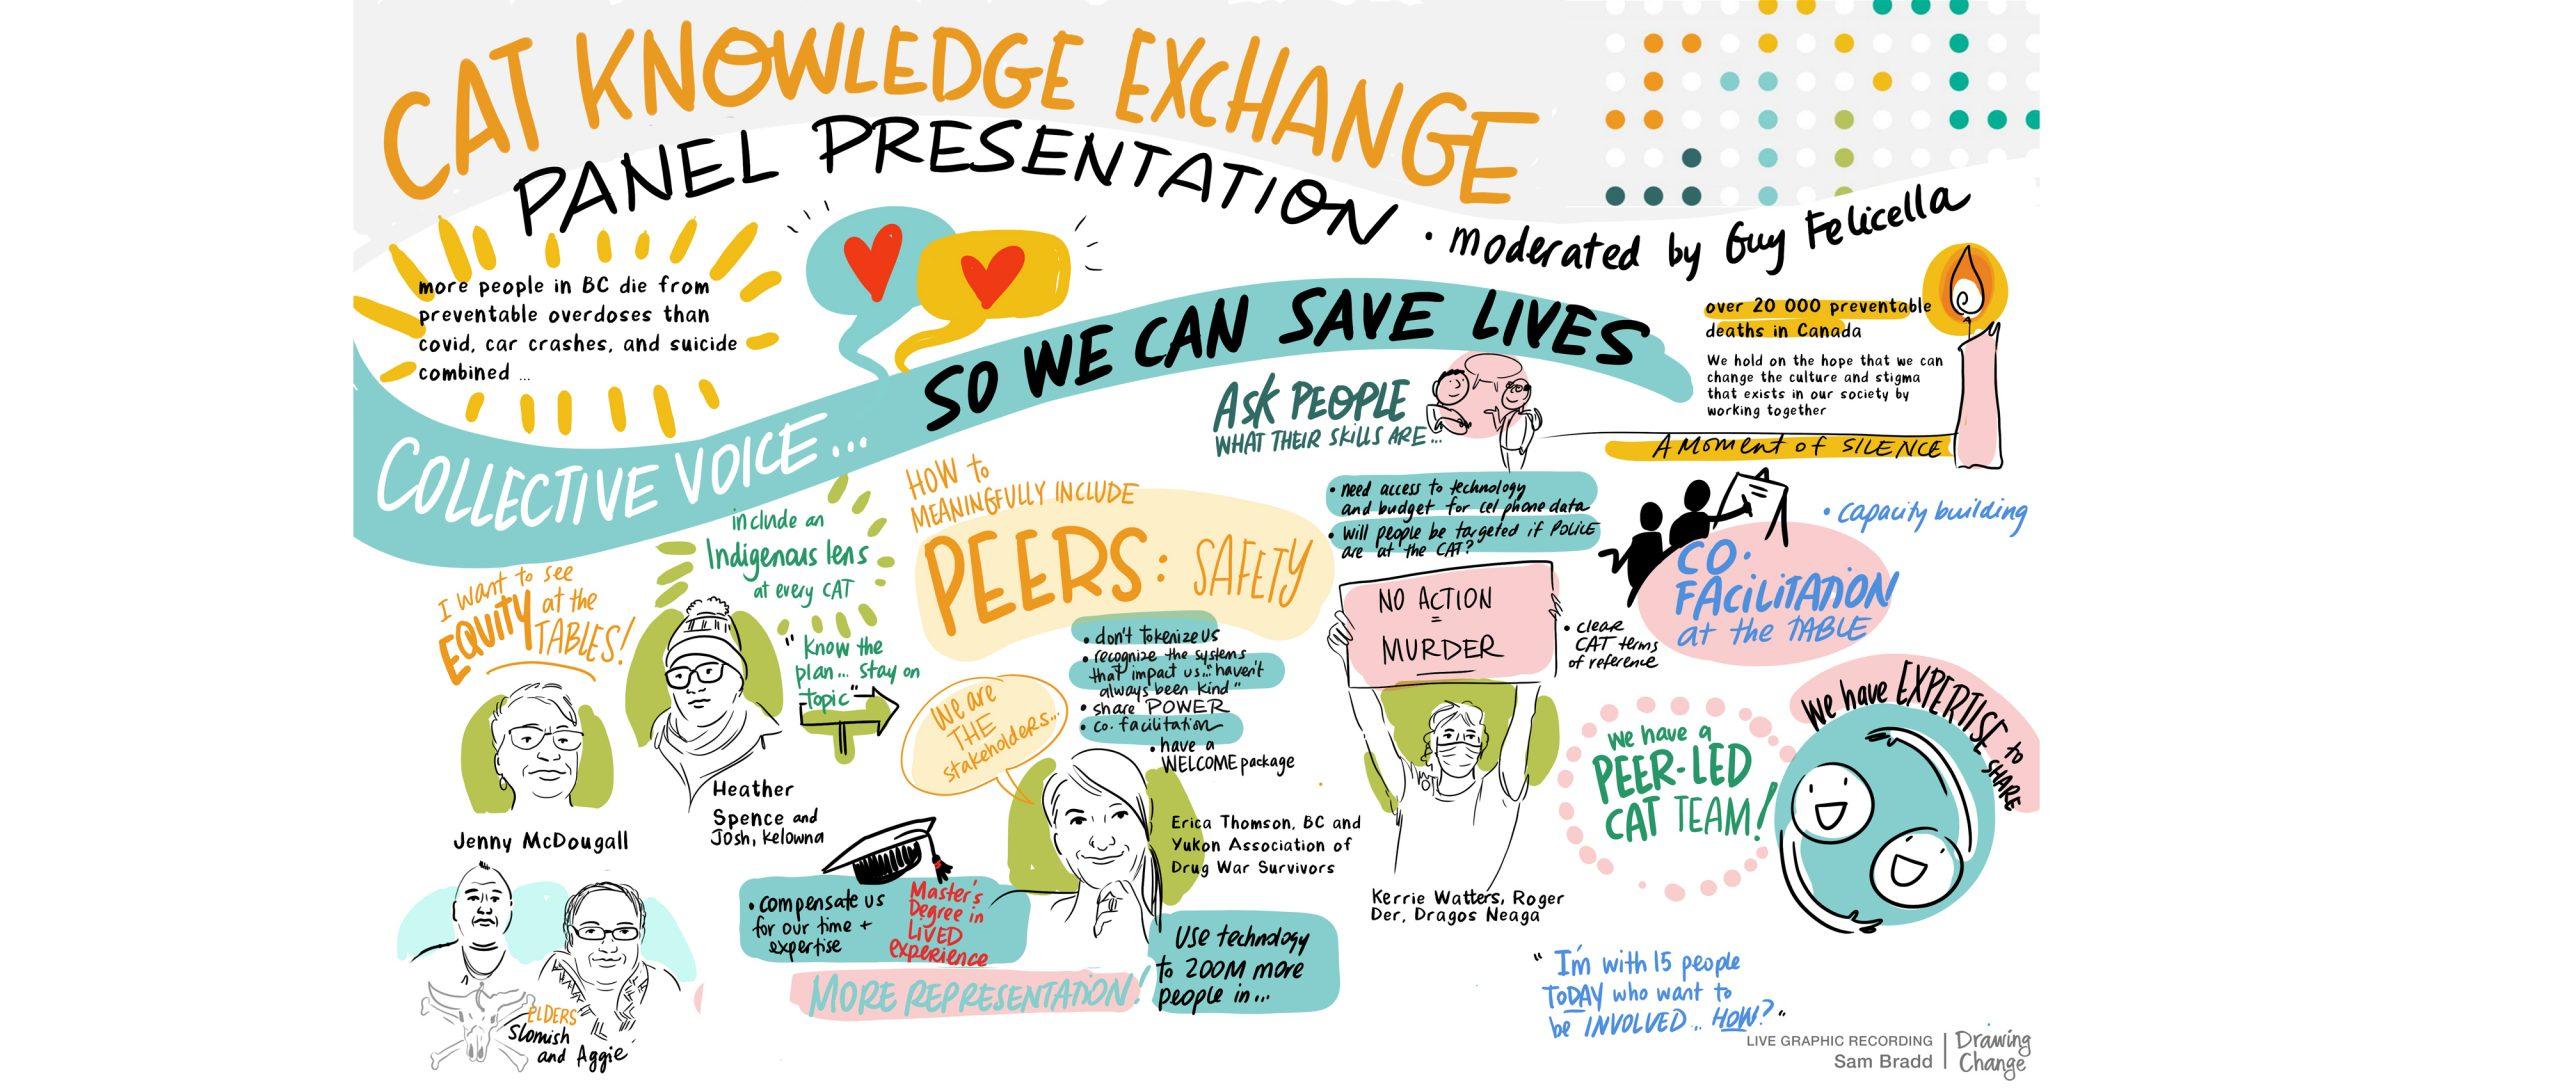 Community Action Team (CAT) Knowledge Exchange Opioid Crisis Resources graphic recording